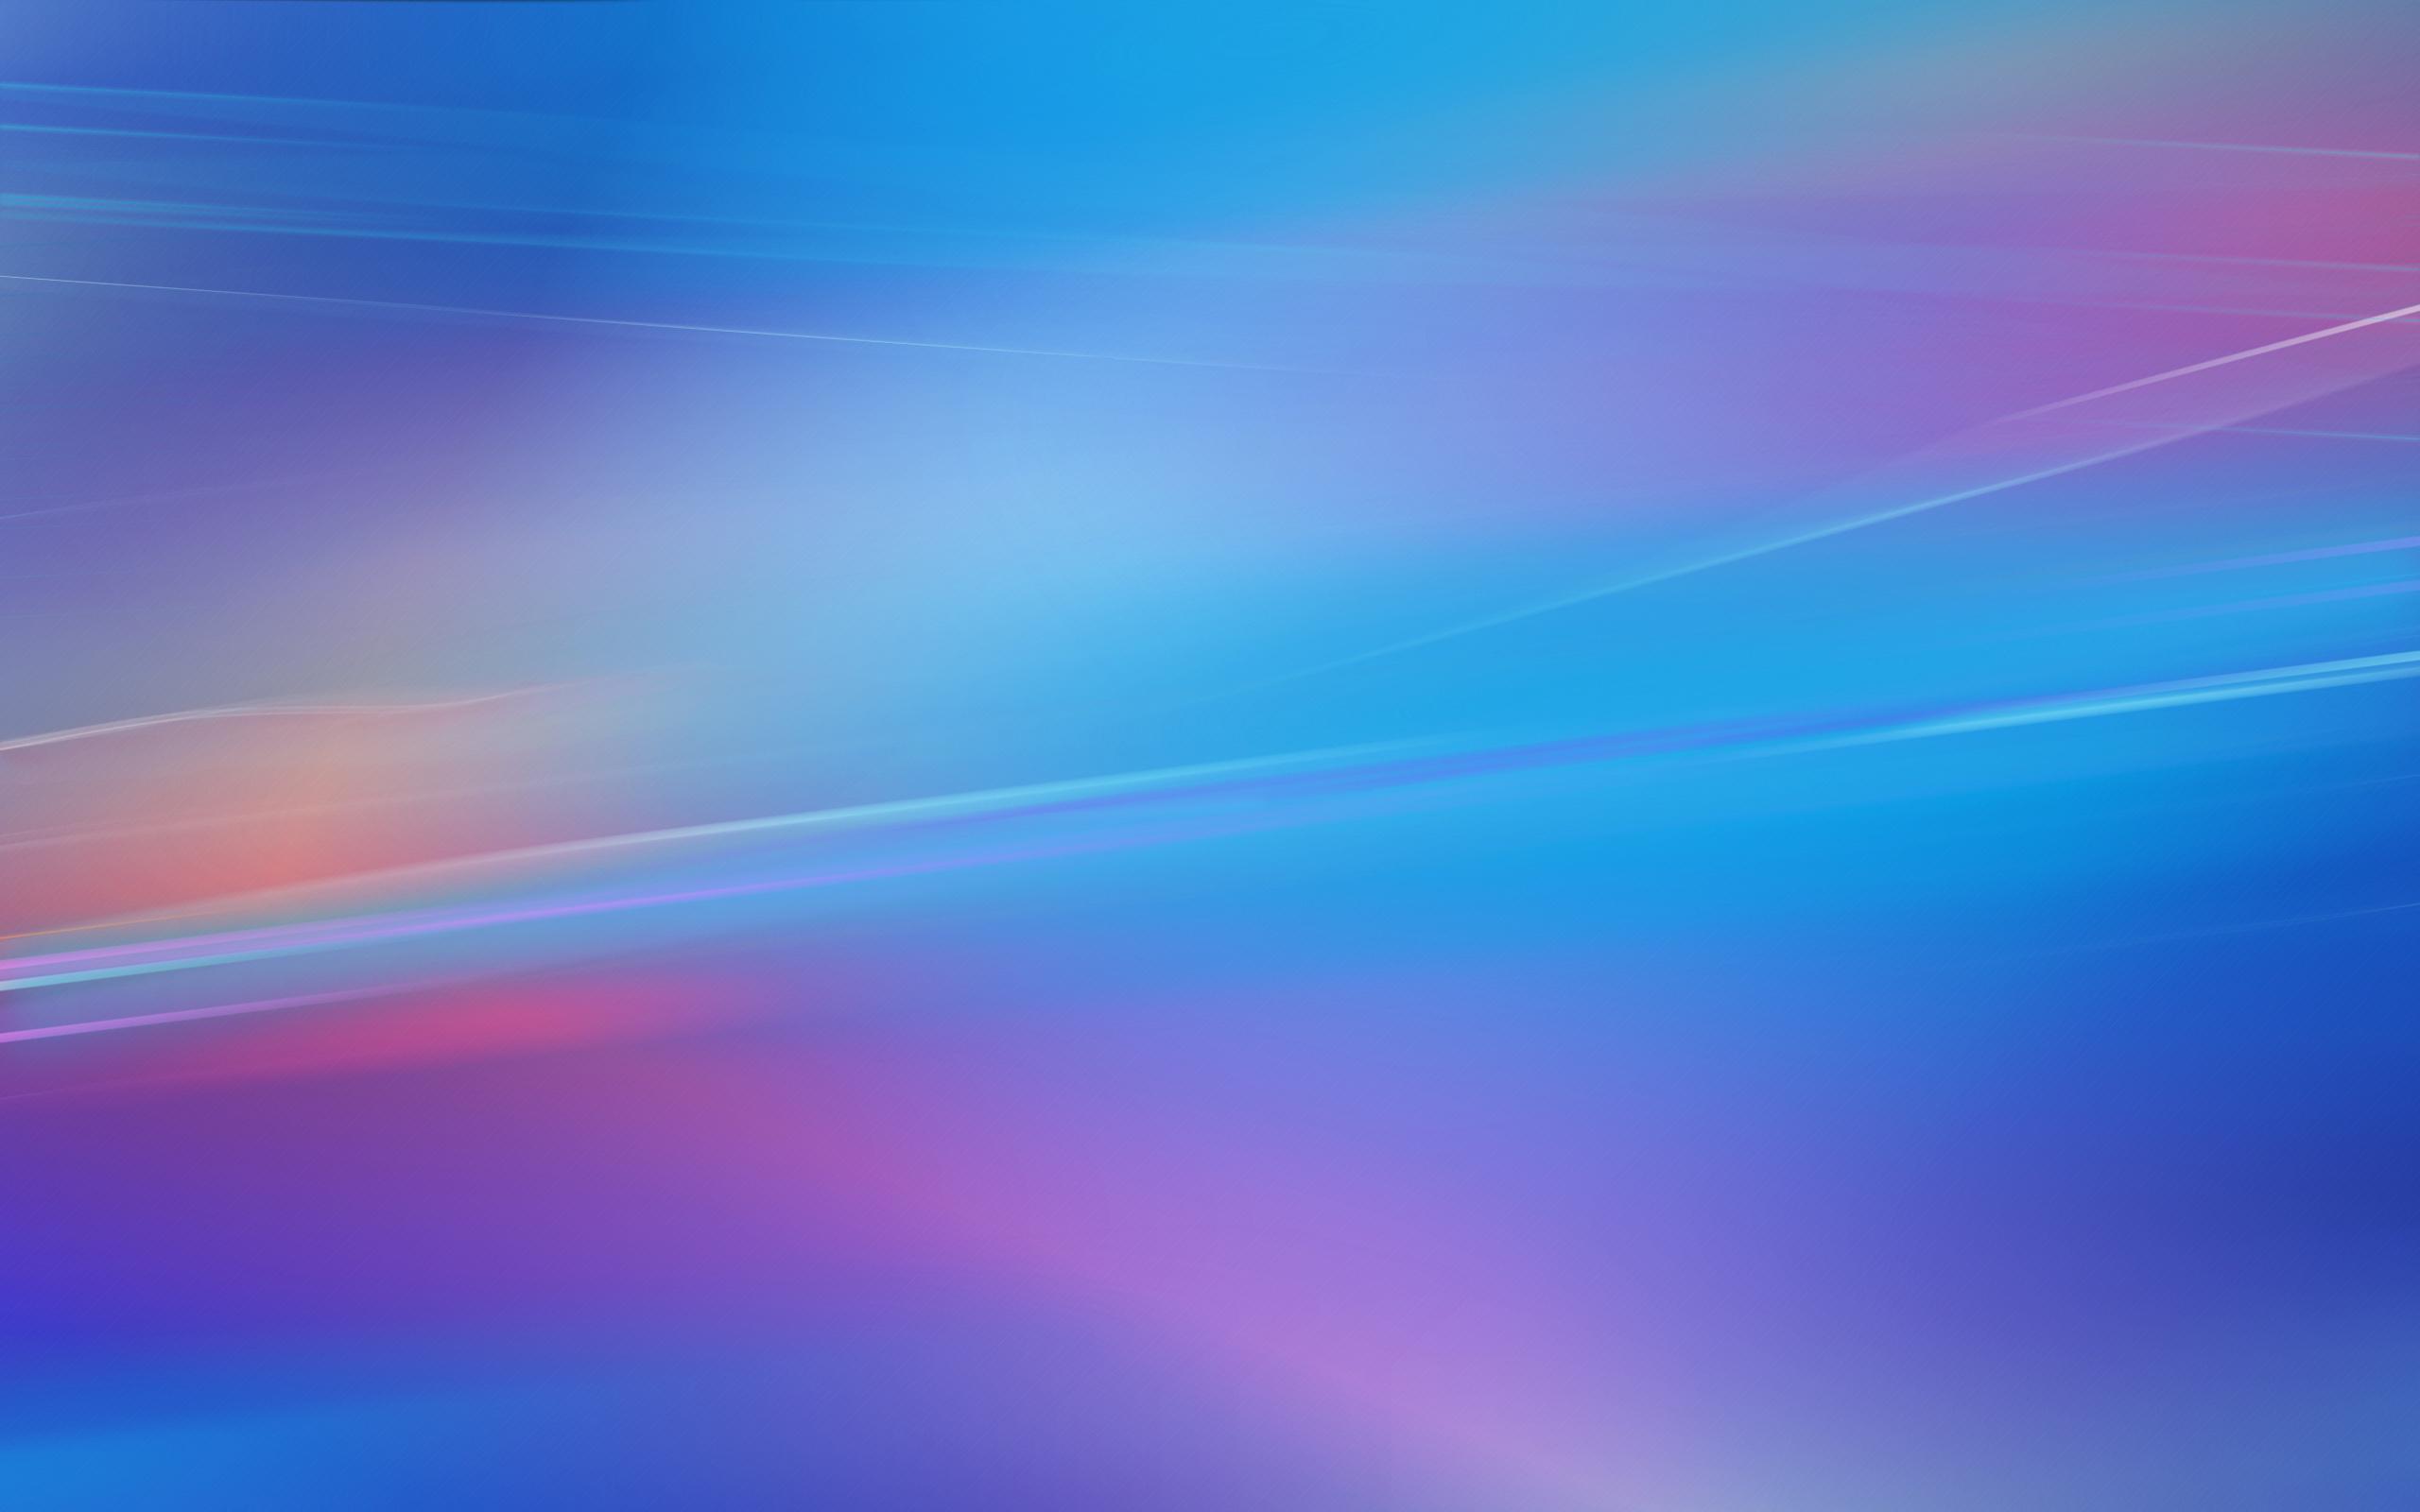 Colors computer wallpapers desktop backgrounds 2560x1600 id